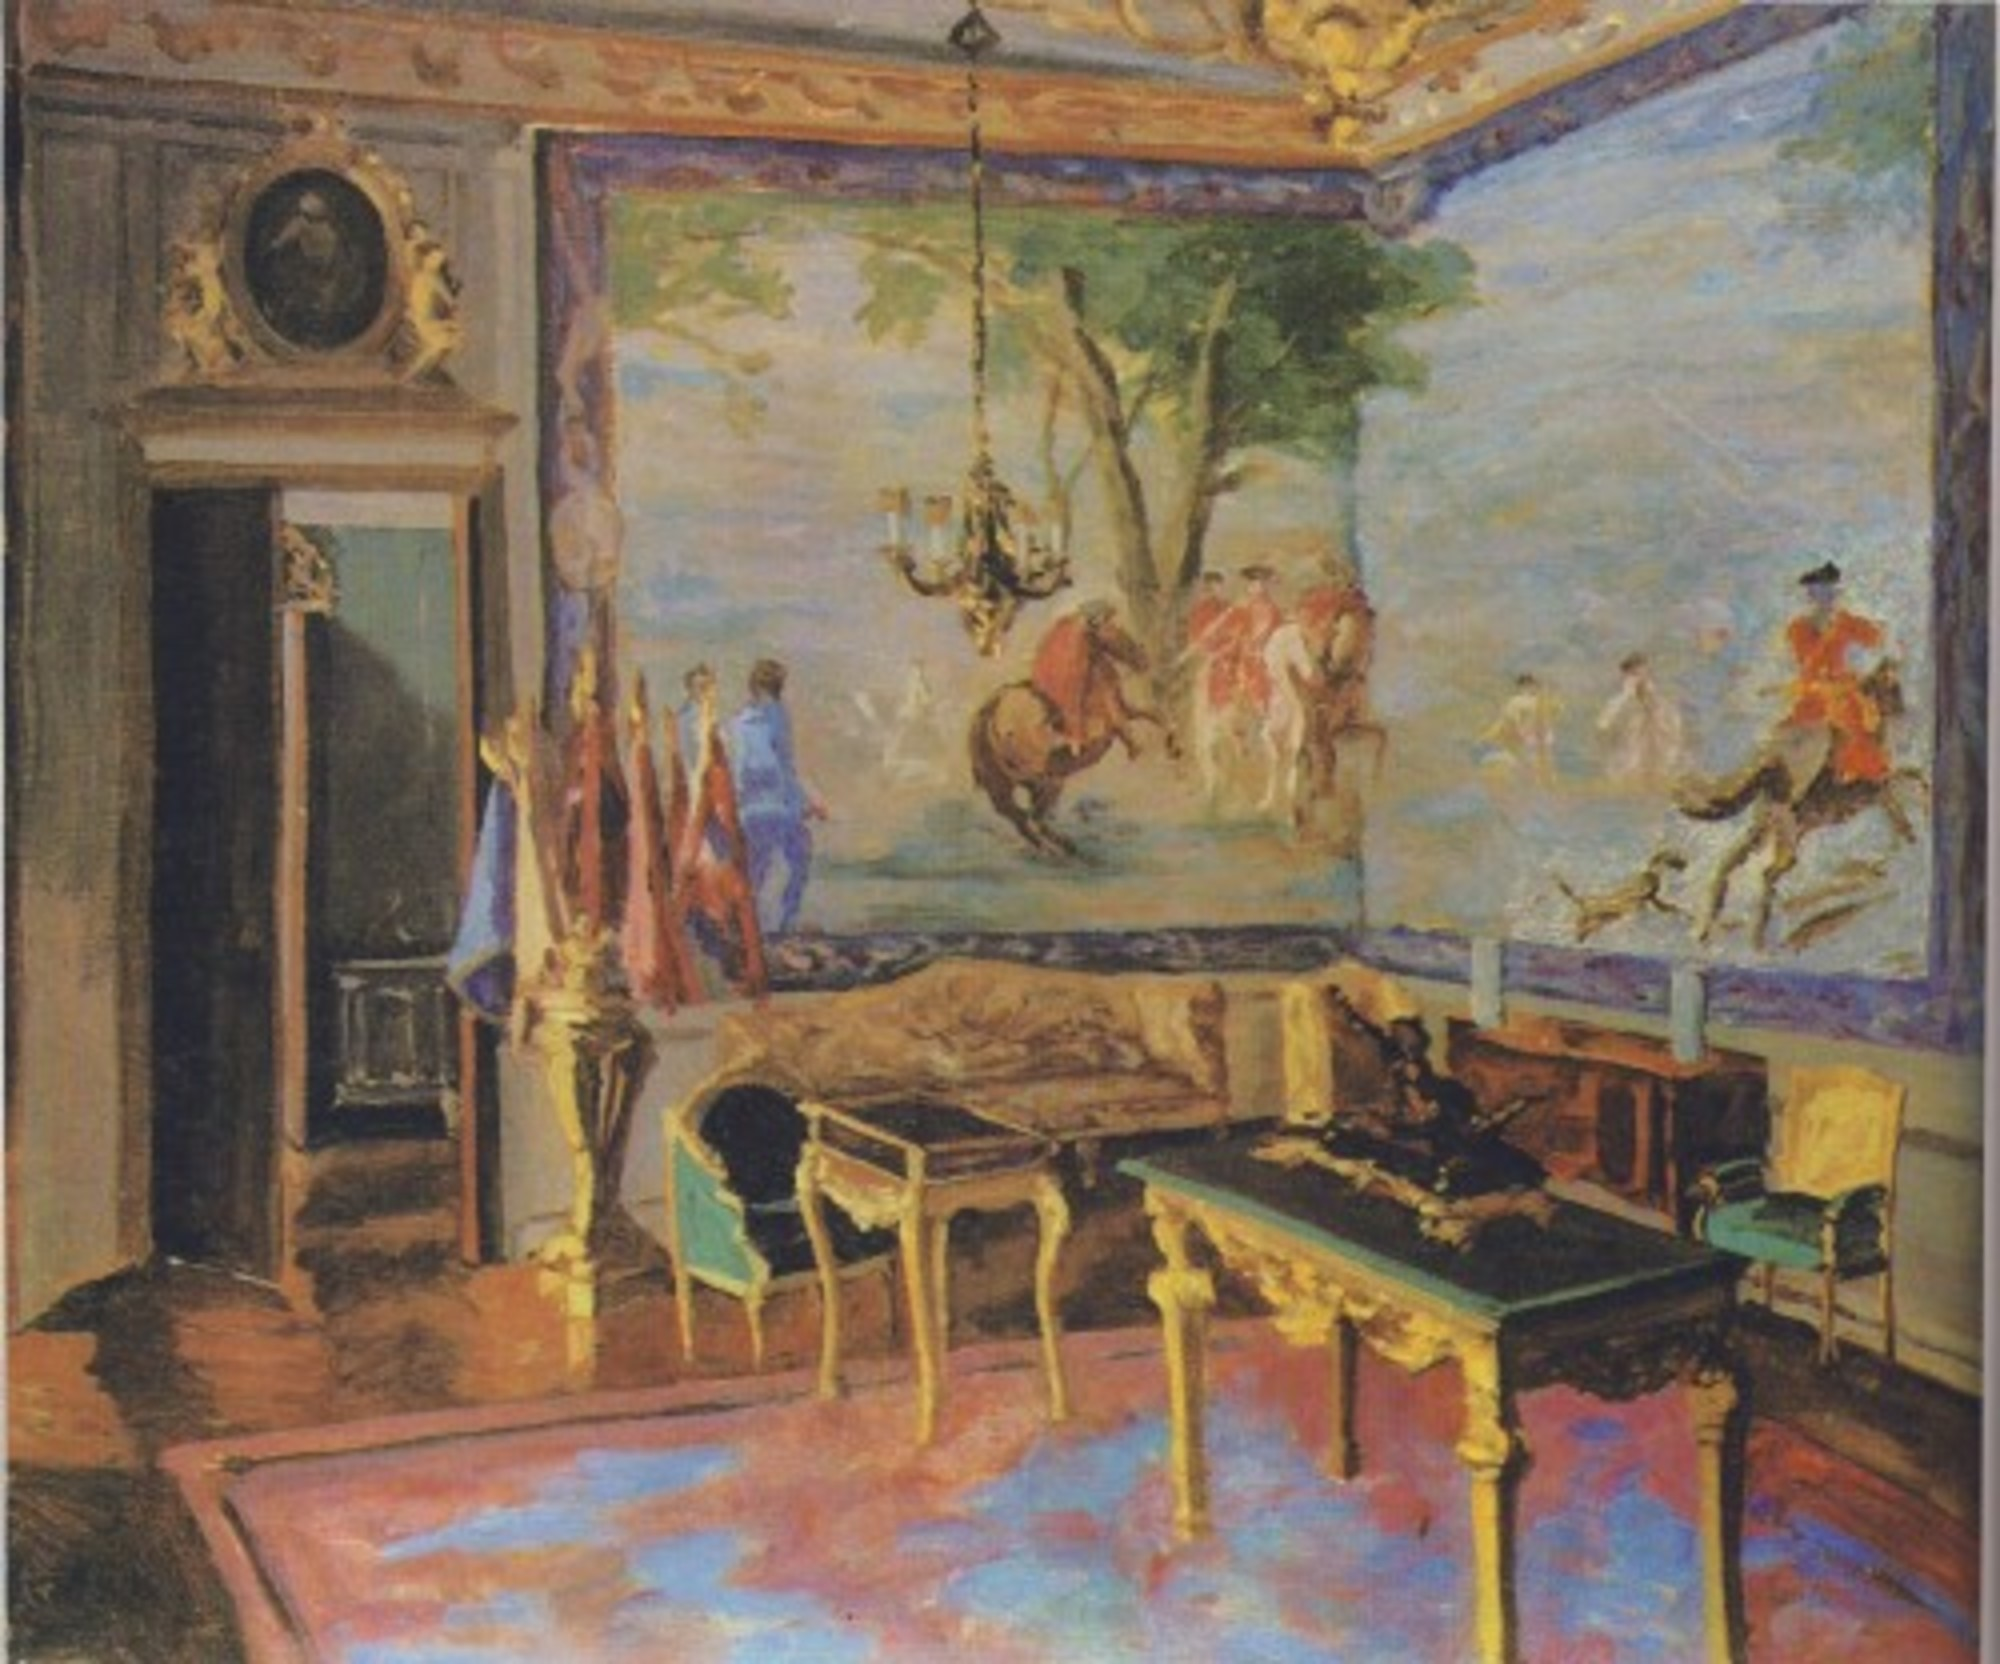 Marlborough-Tapestries-at-Blenheim.jpg